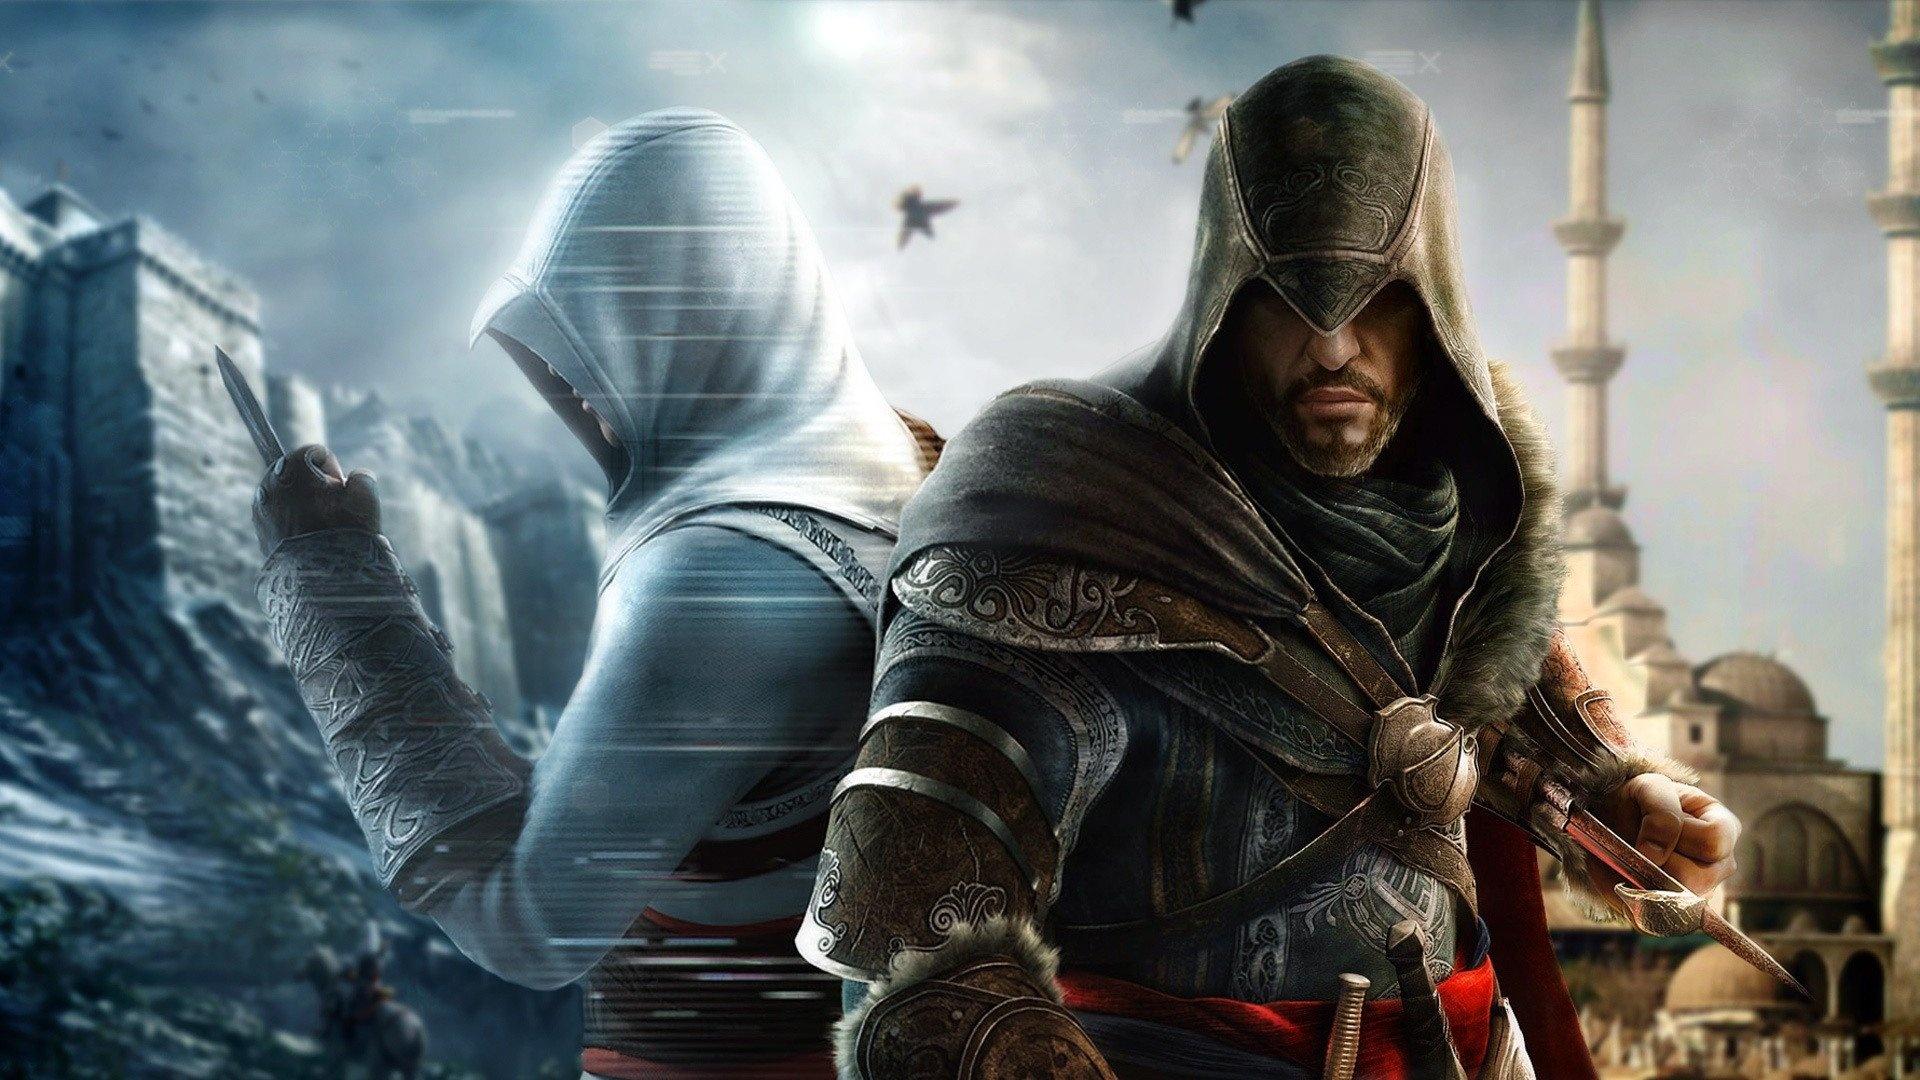 Assassins Creed Art Full HD Desktop Wallpapers 1080p 1920x1080